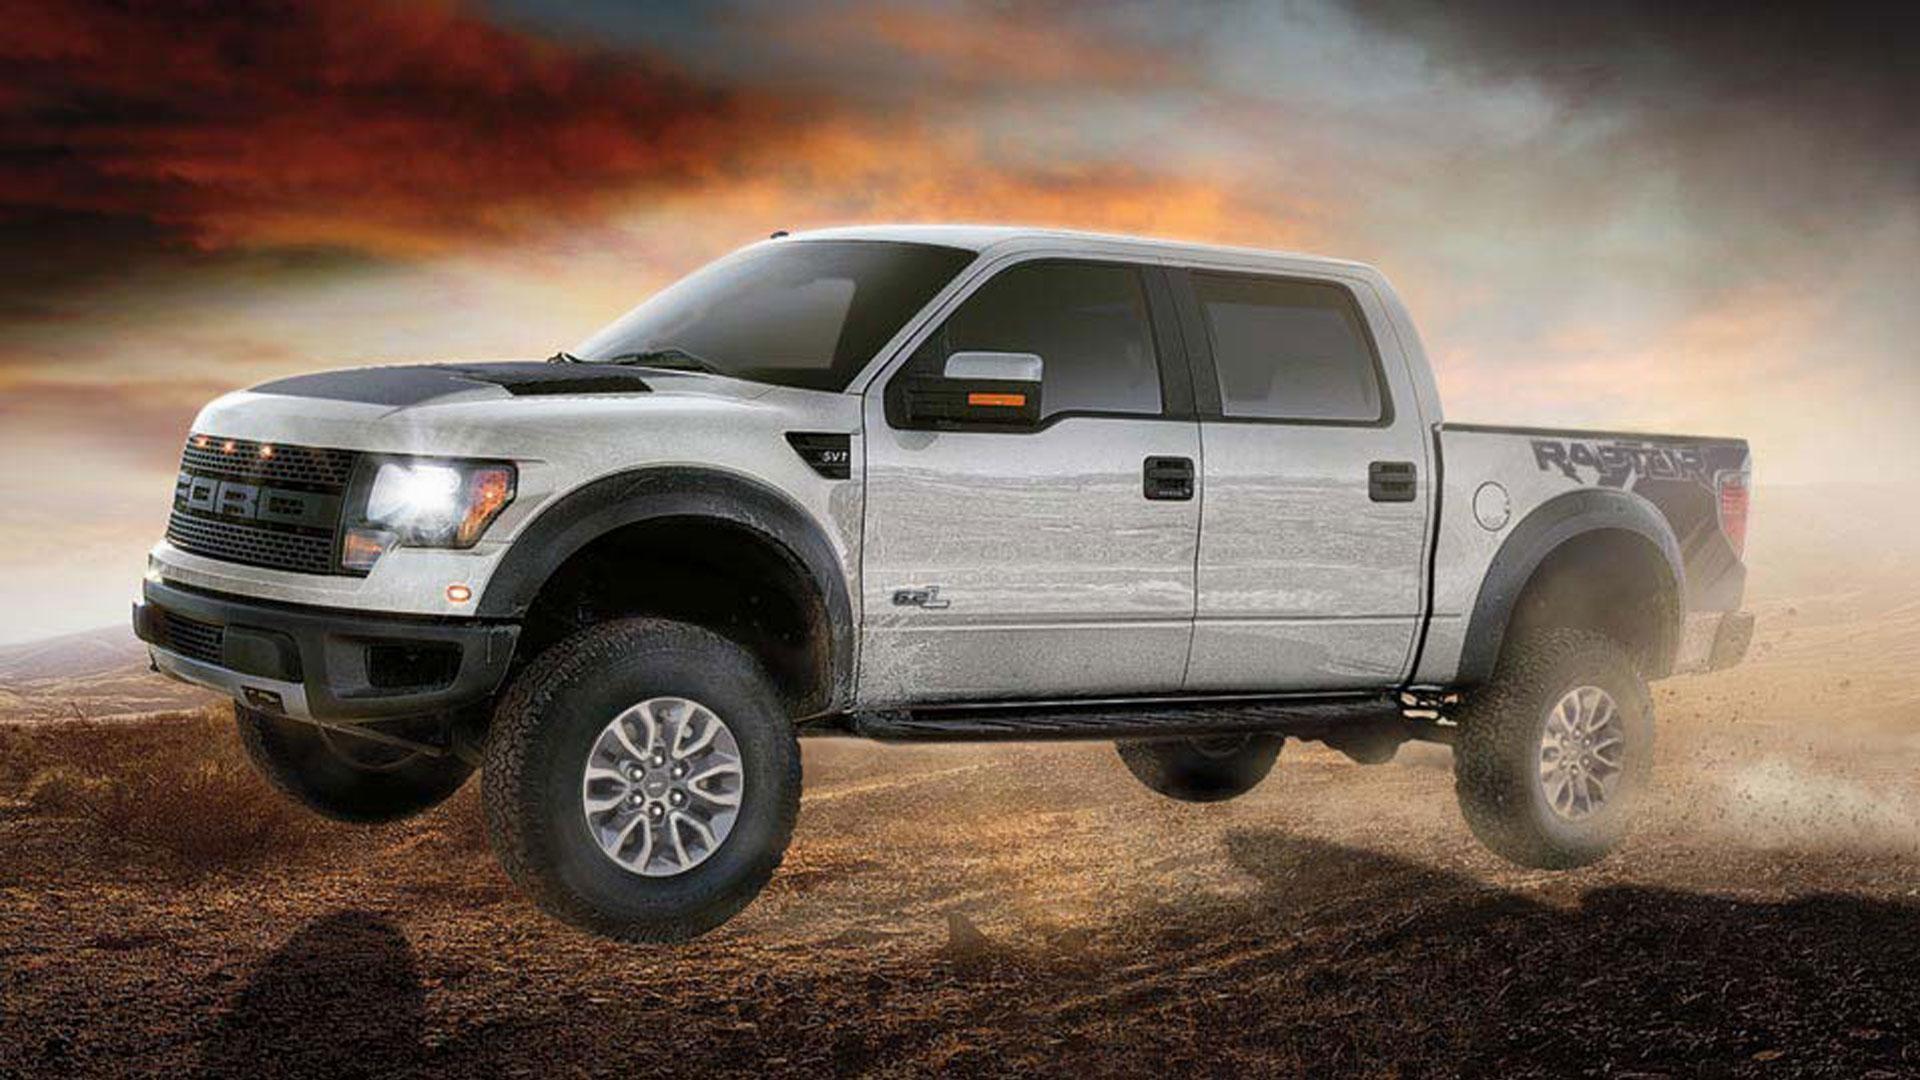 wallpaper.wiki-Ford-Raptor-HD-Wallpapers-Free-Download-